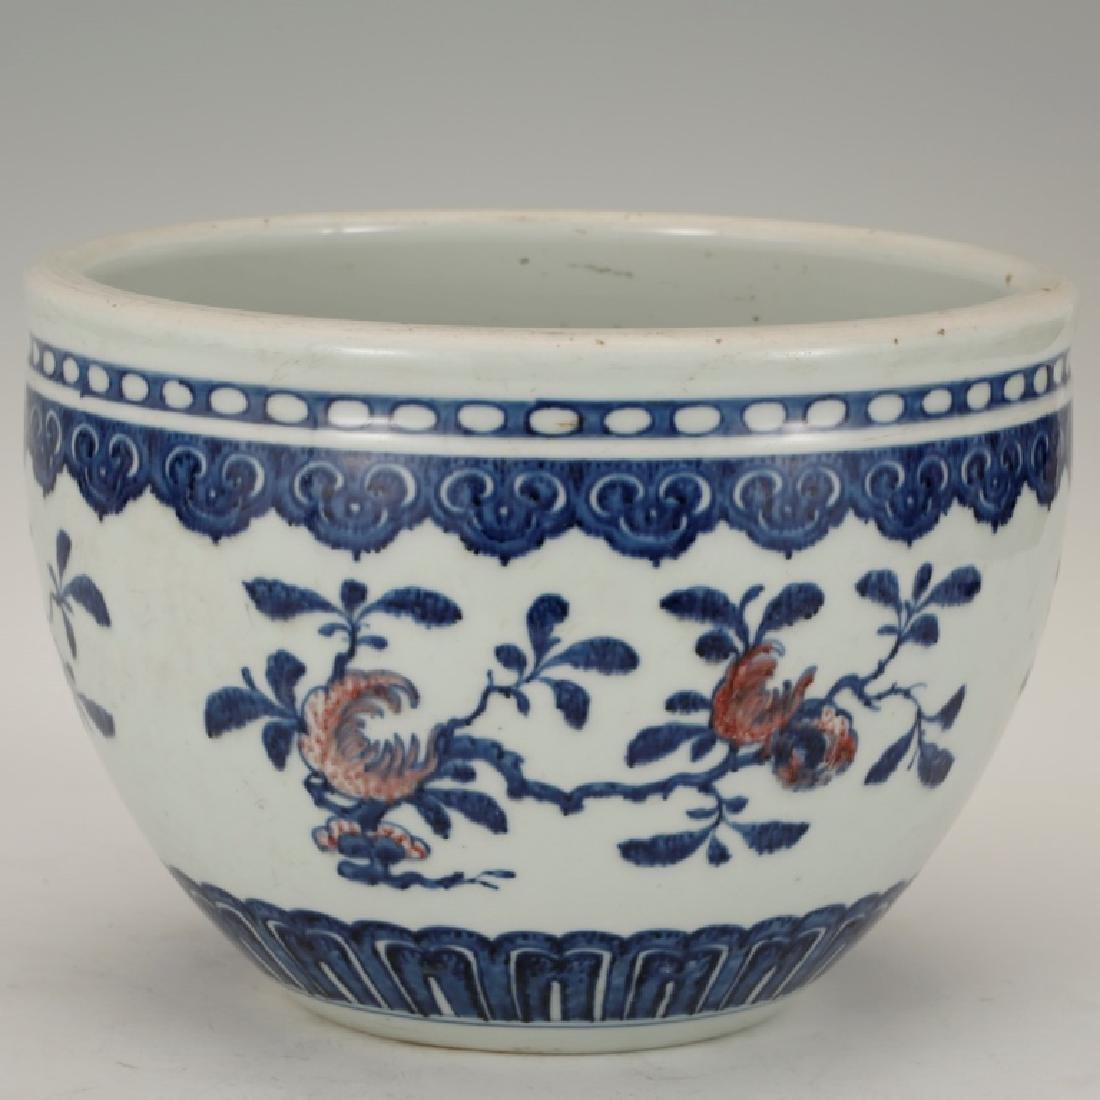 Chinese Underglaze Blue & Red Porcelain Planter